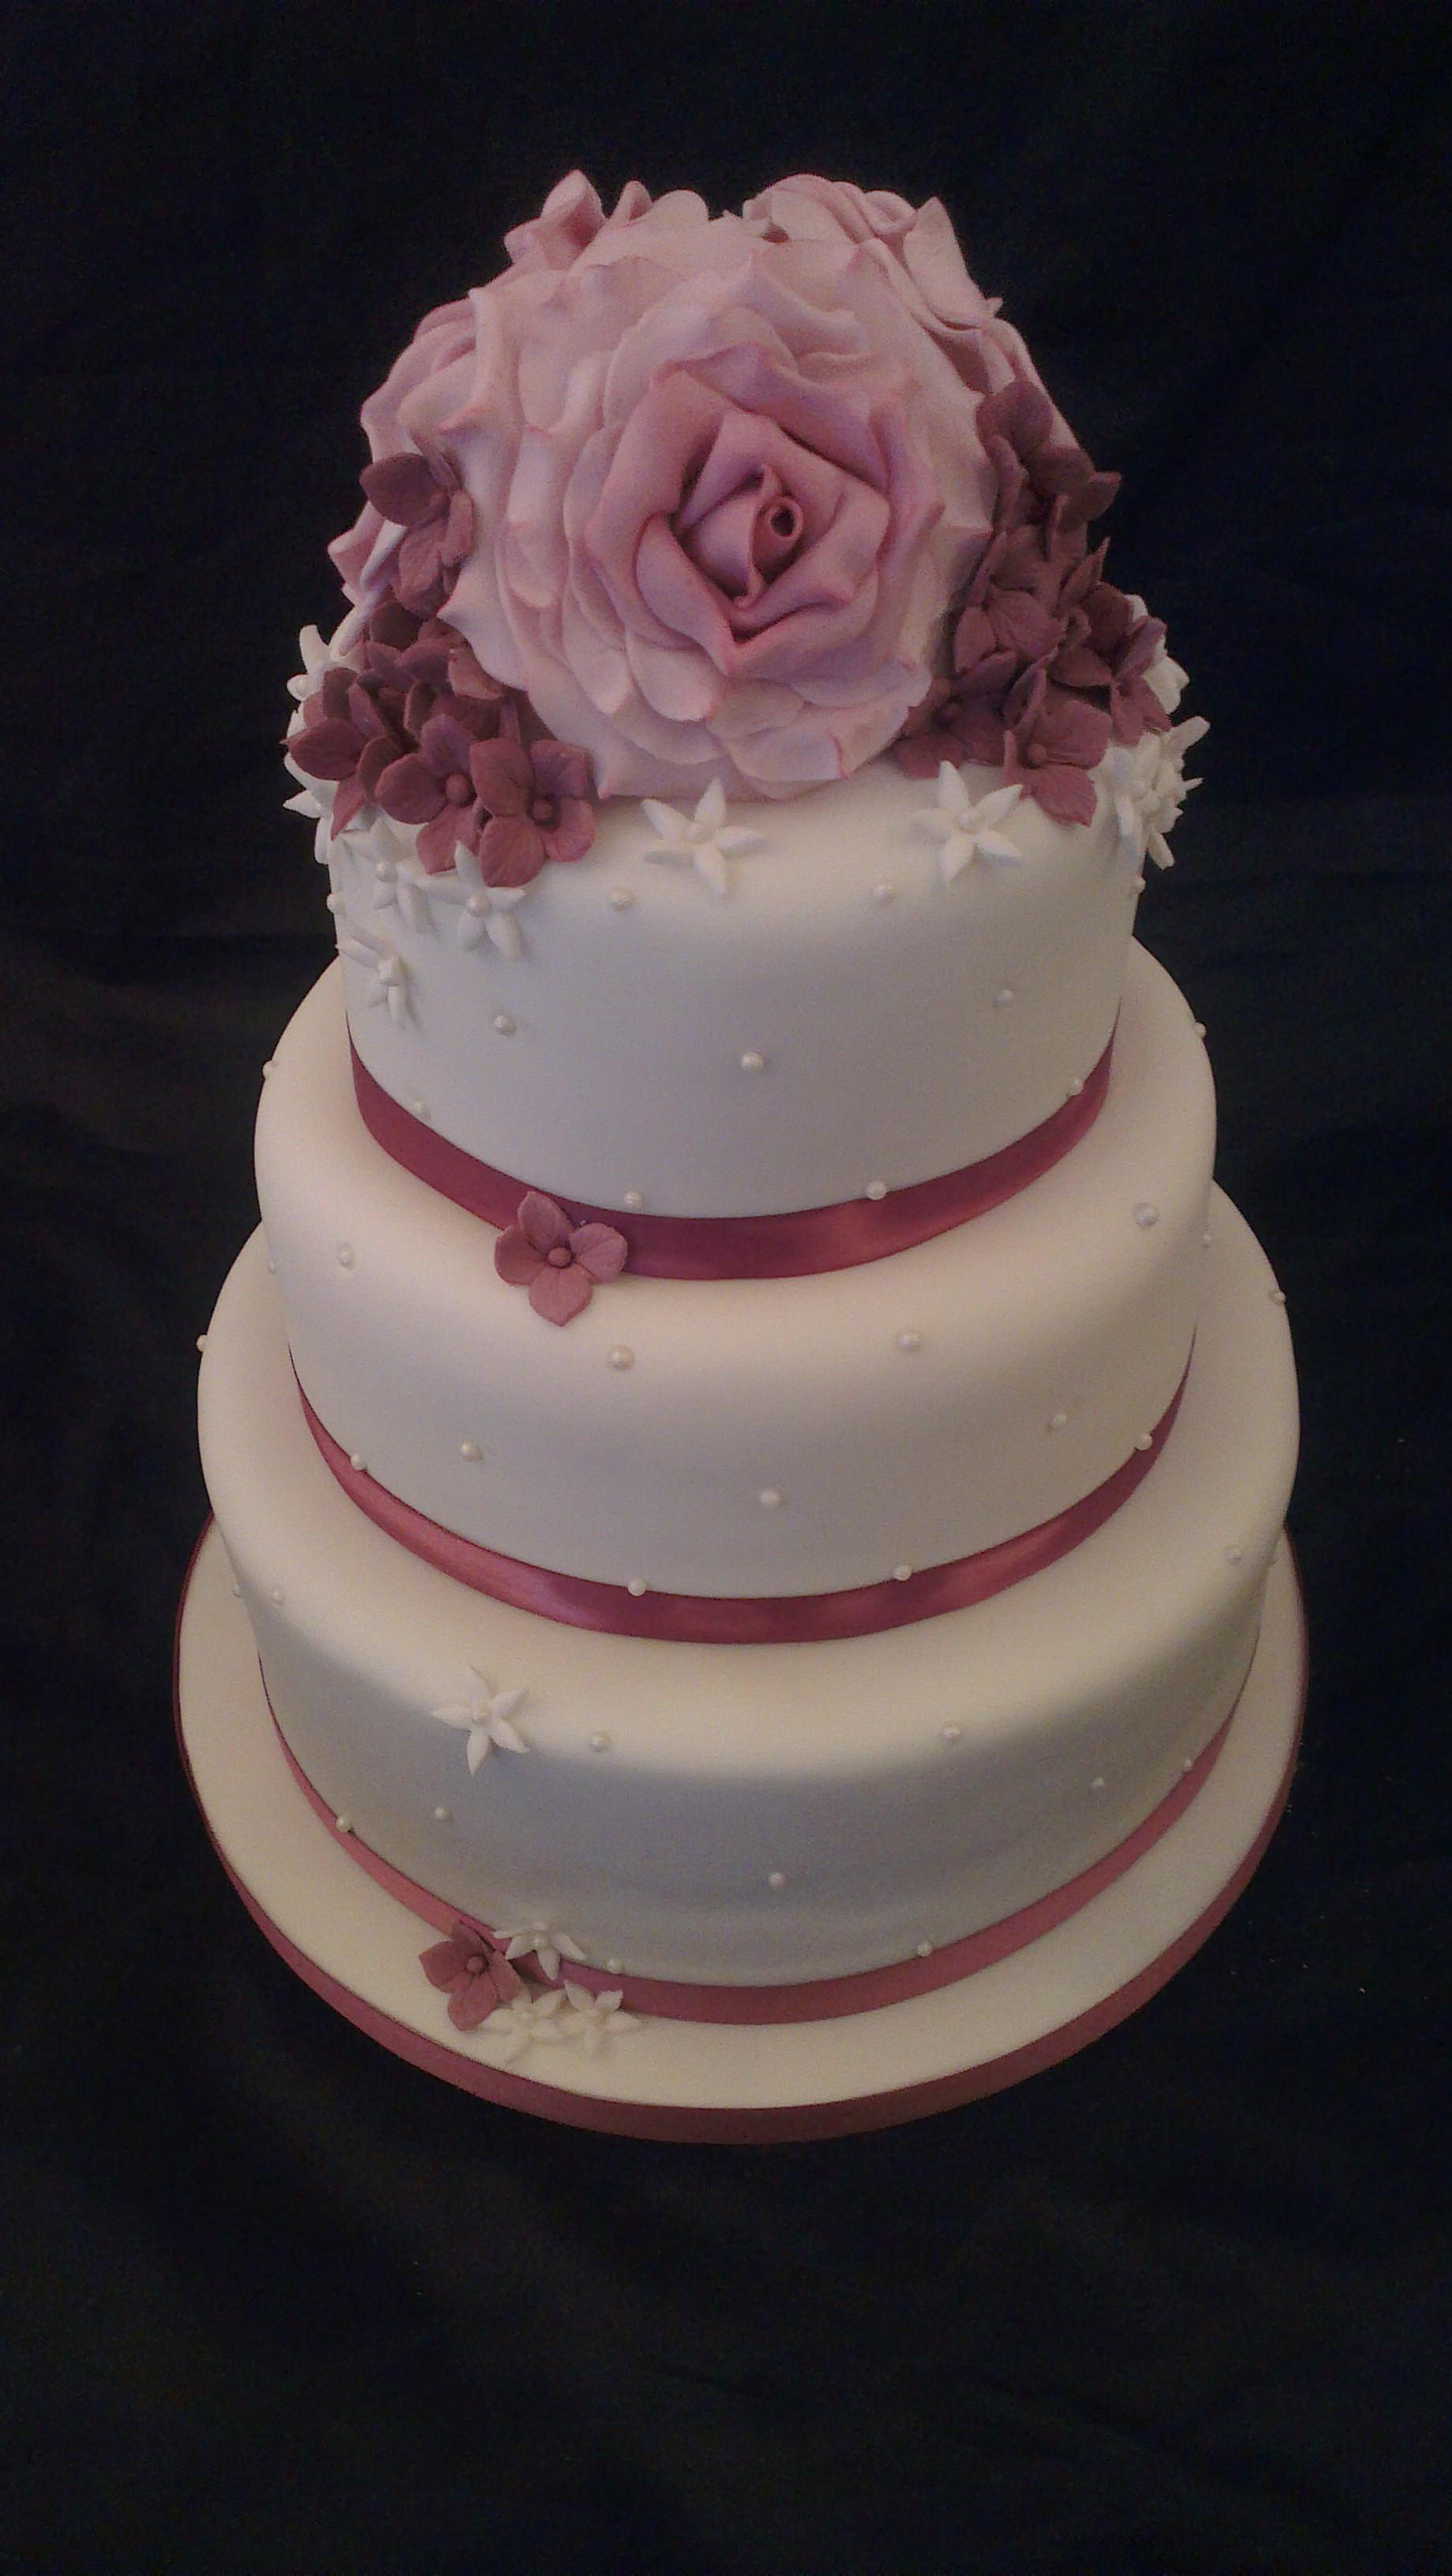 Who Makes Wedding Cakes  Wedding cakes Telford Shropshire fruitcake chocolate